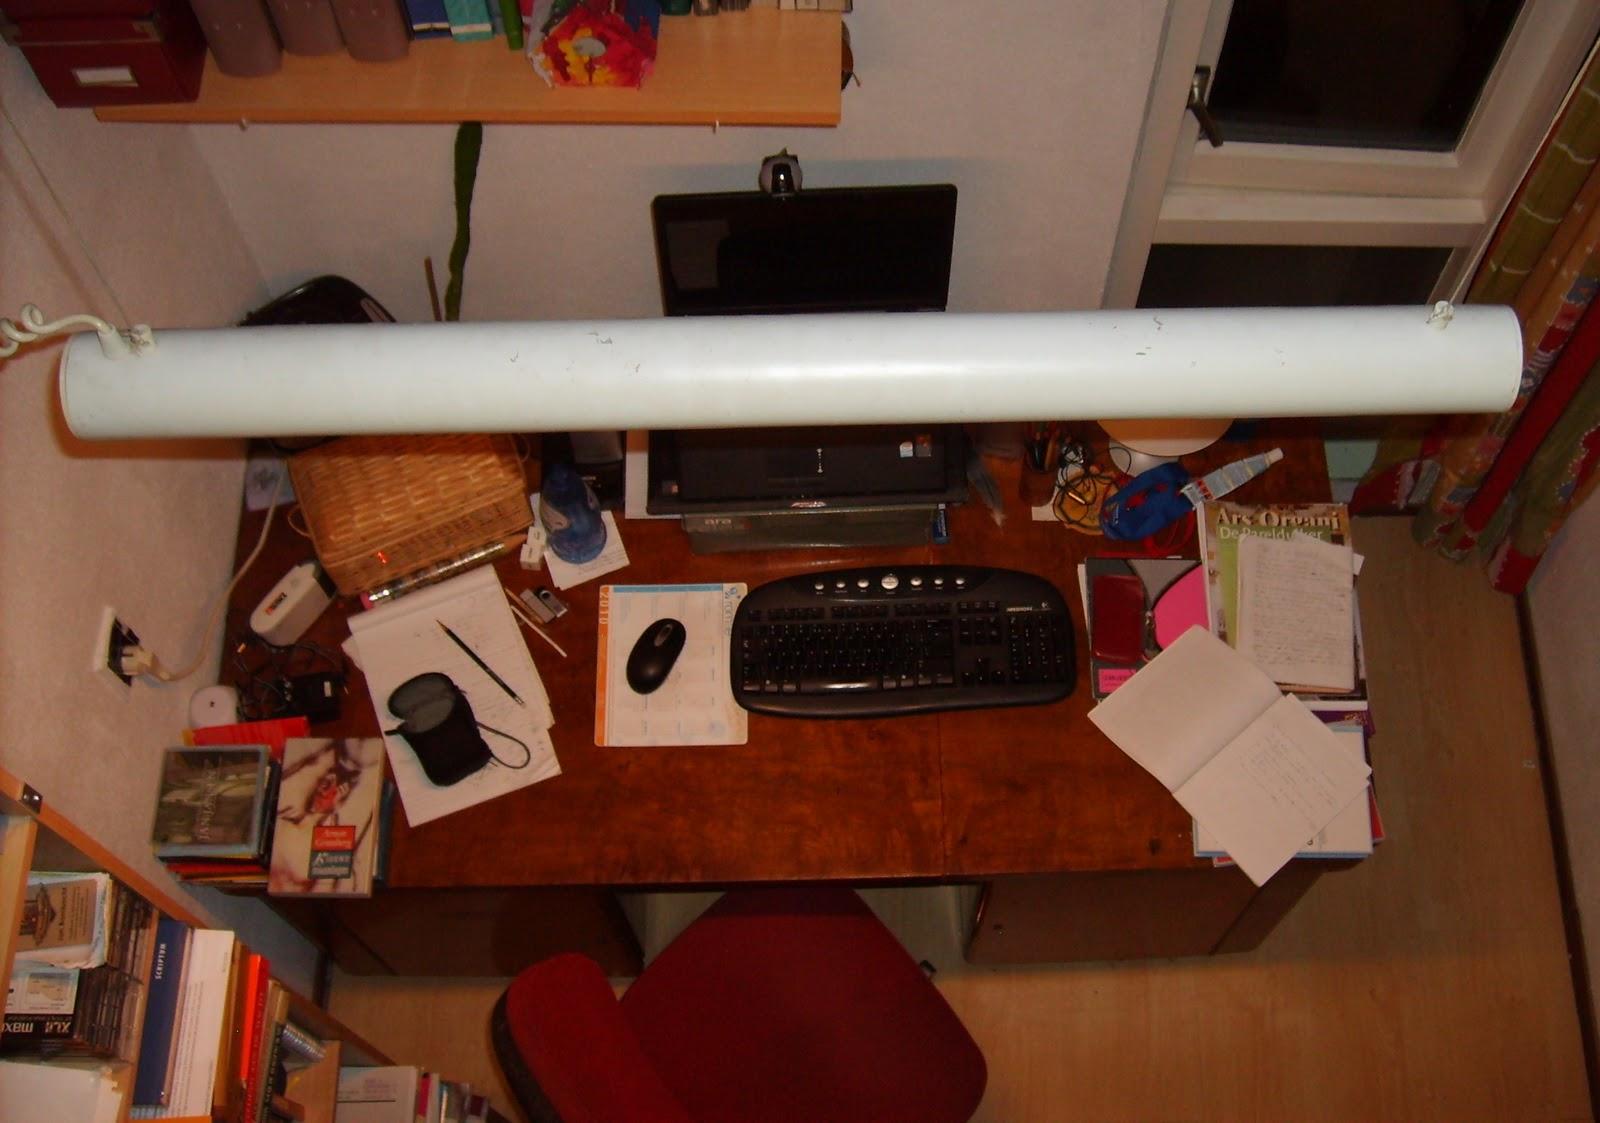 Bureau Hang Tl Lamp.Tl Lamp Bureau Vernstok